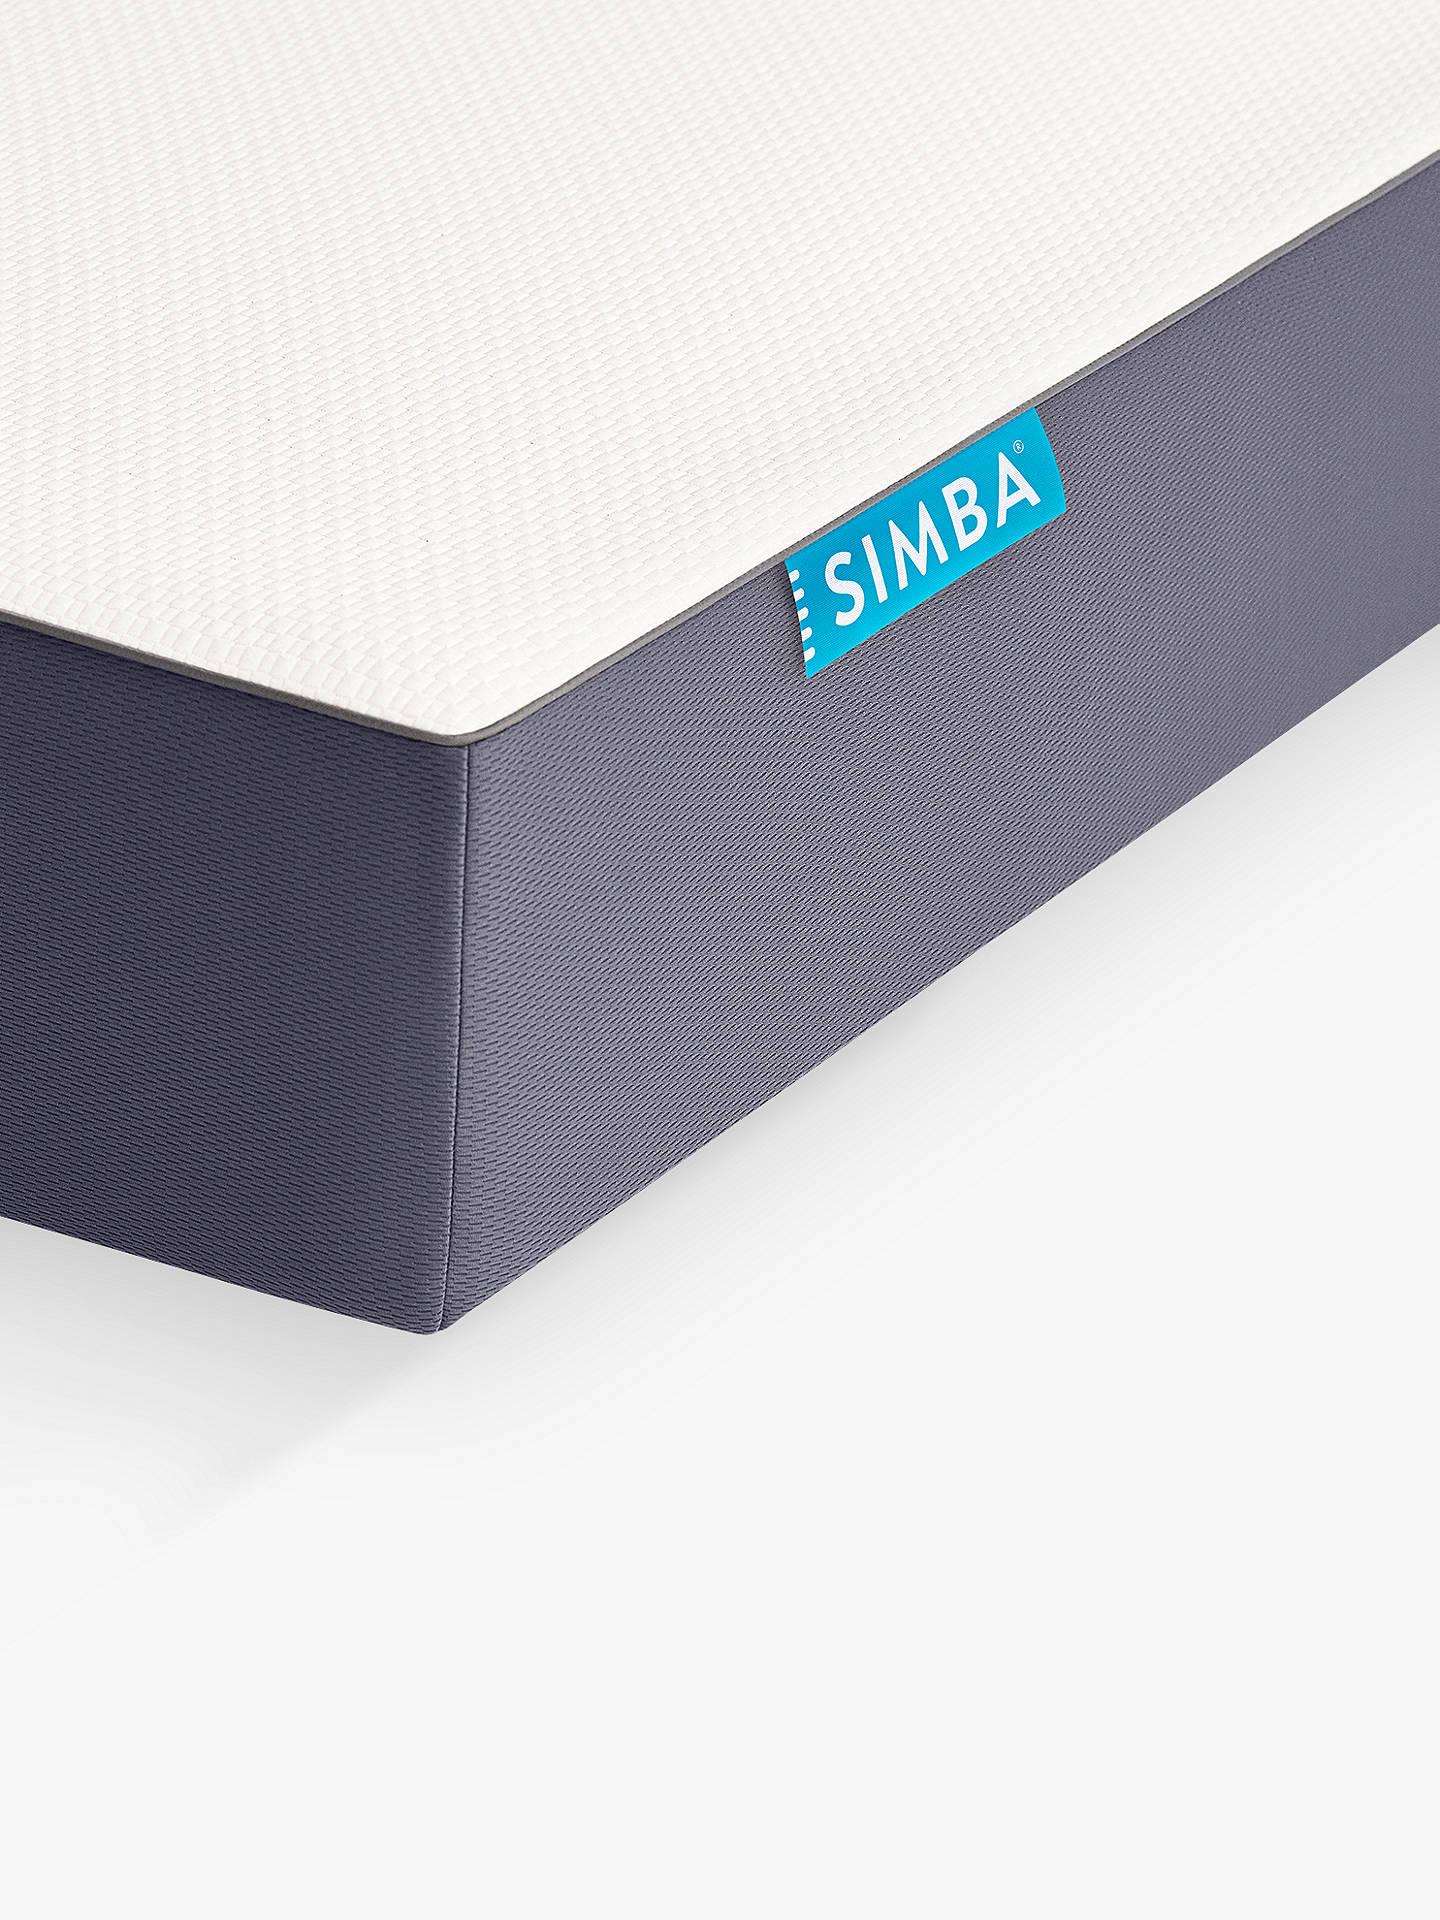 simba hybrid memory foam pocket spring mattress medium tension king size at john lewis partners. Black Bedroom Furniture Sets. Home Design Ideas